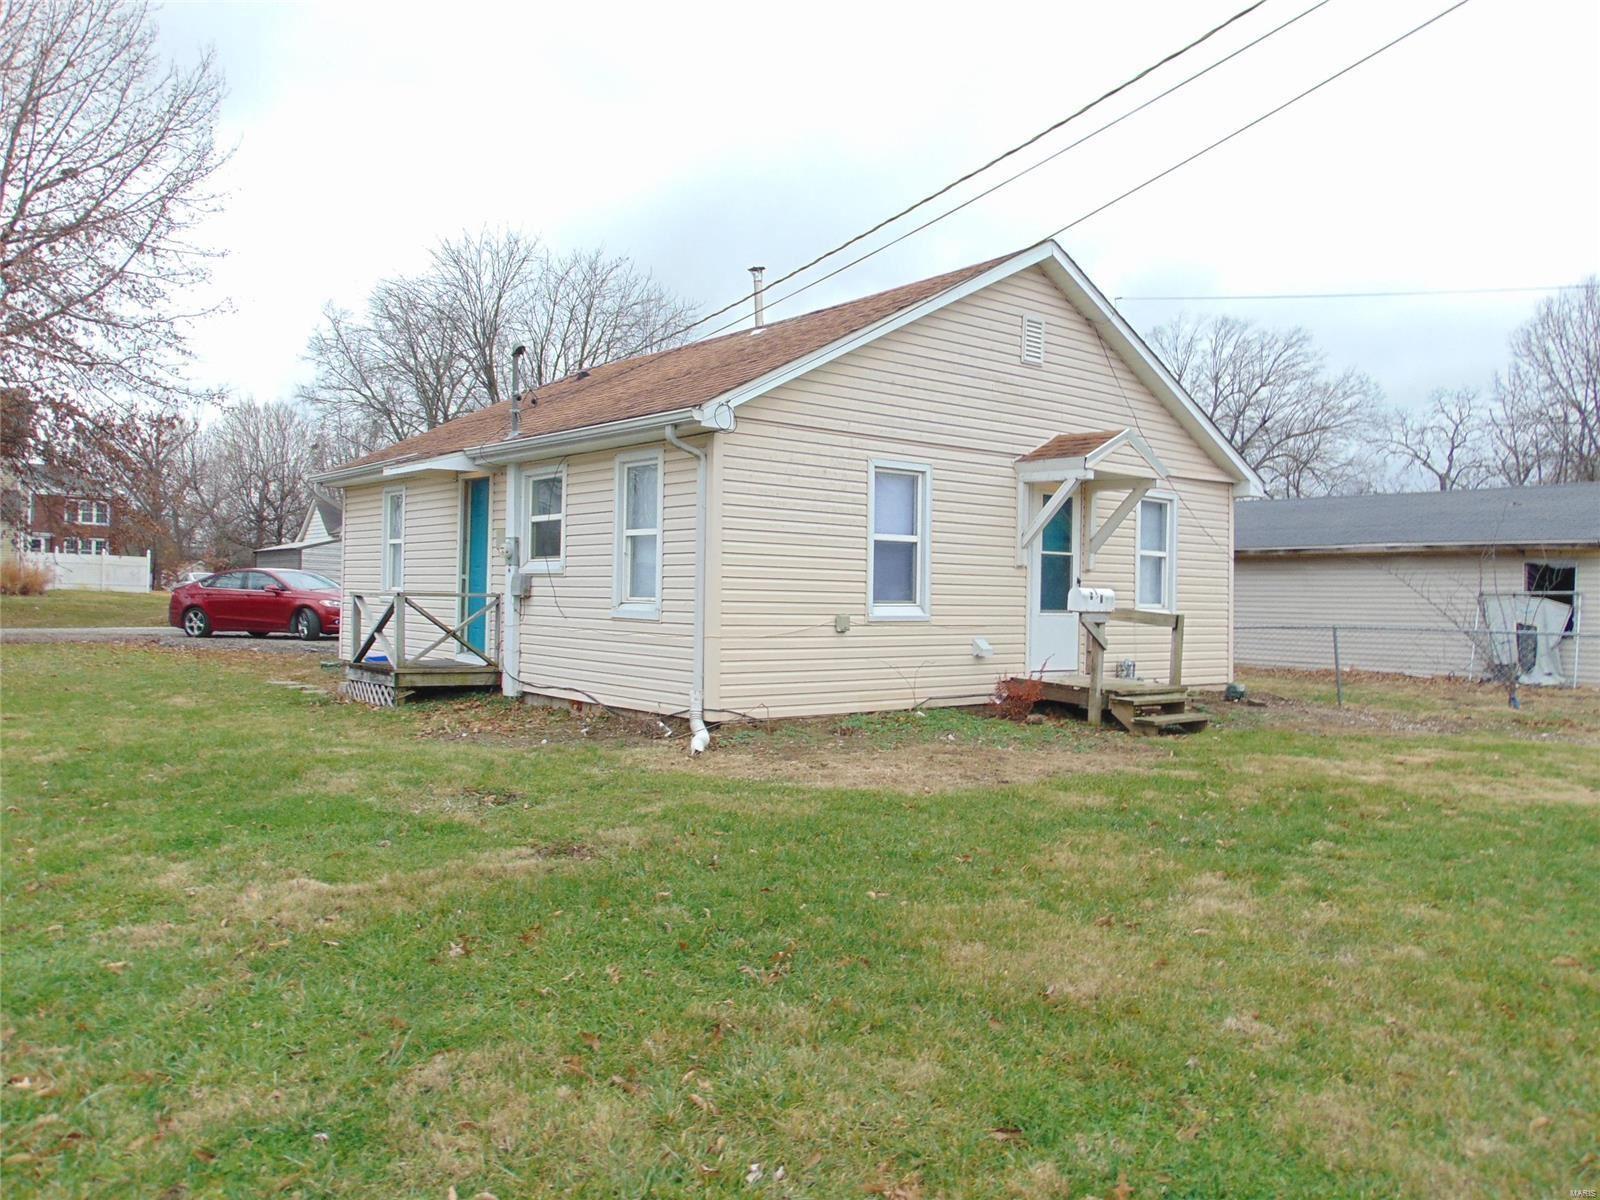 5 West Delmar, Alton, IL 62002 - MLS#: 20089026